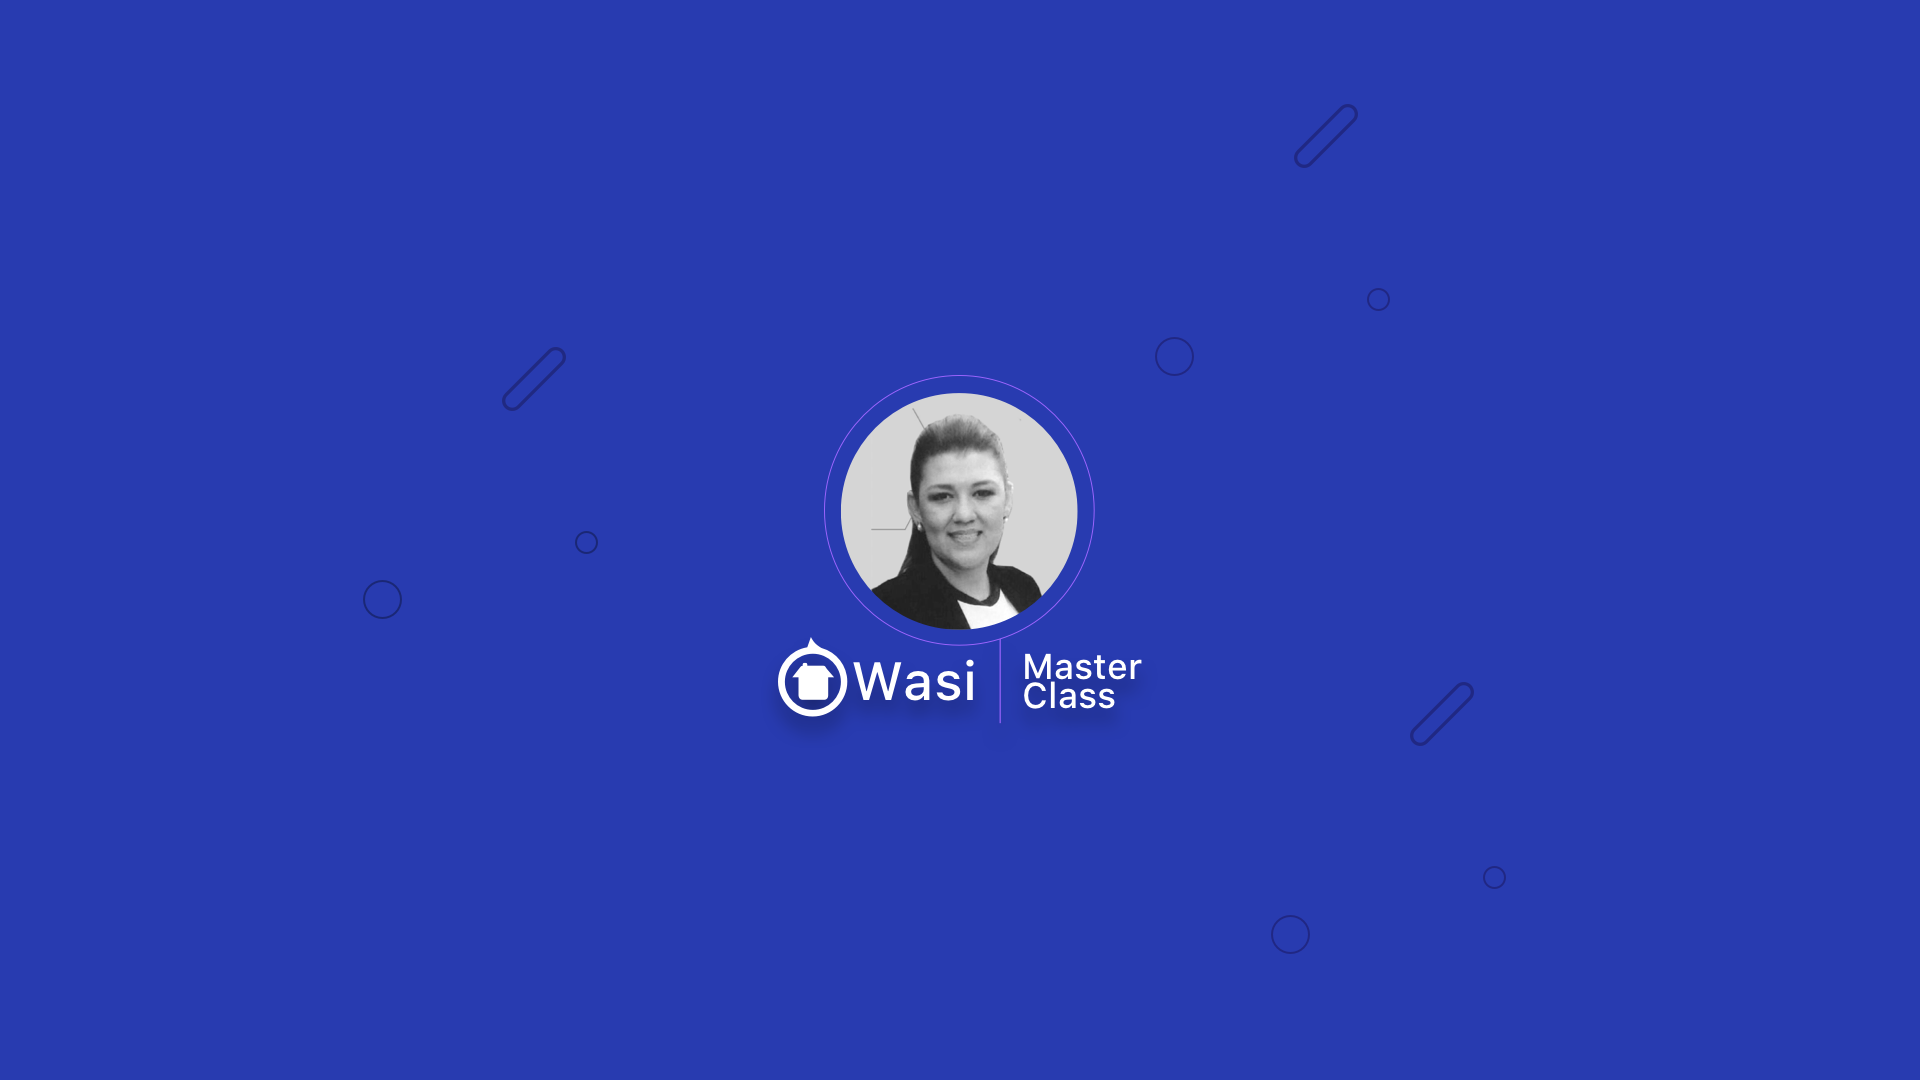 wasi master class experiencia de cliente inmobiliario parte 2